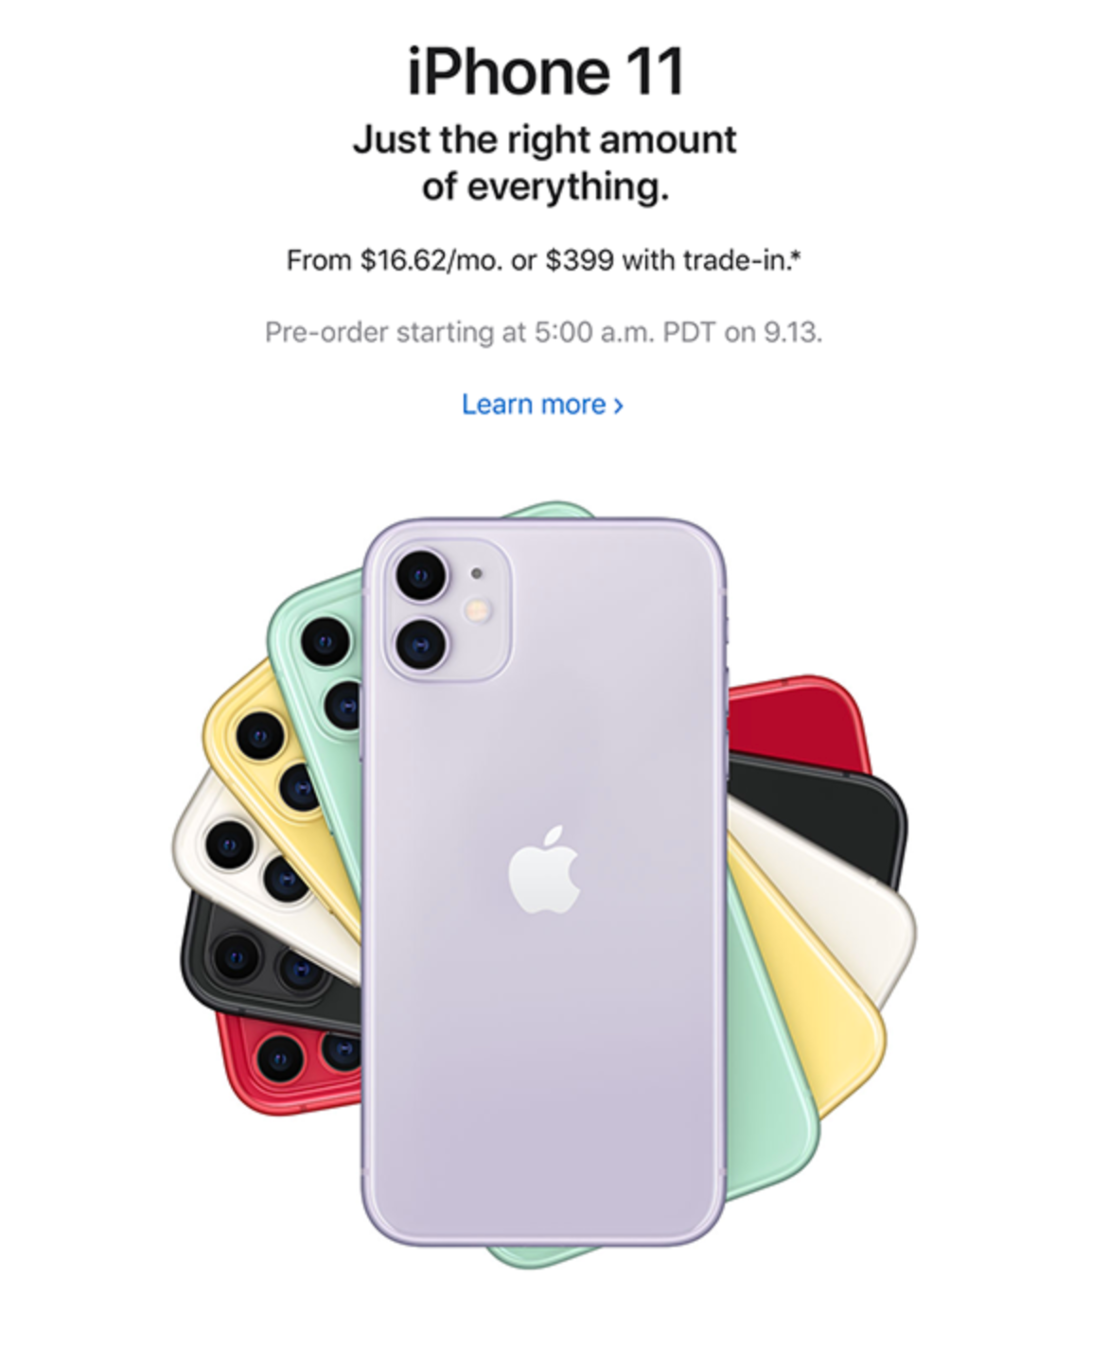 Apple newsletter for iPhone 11